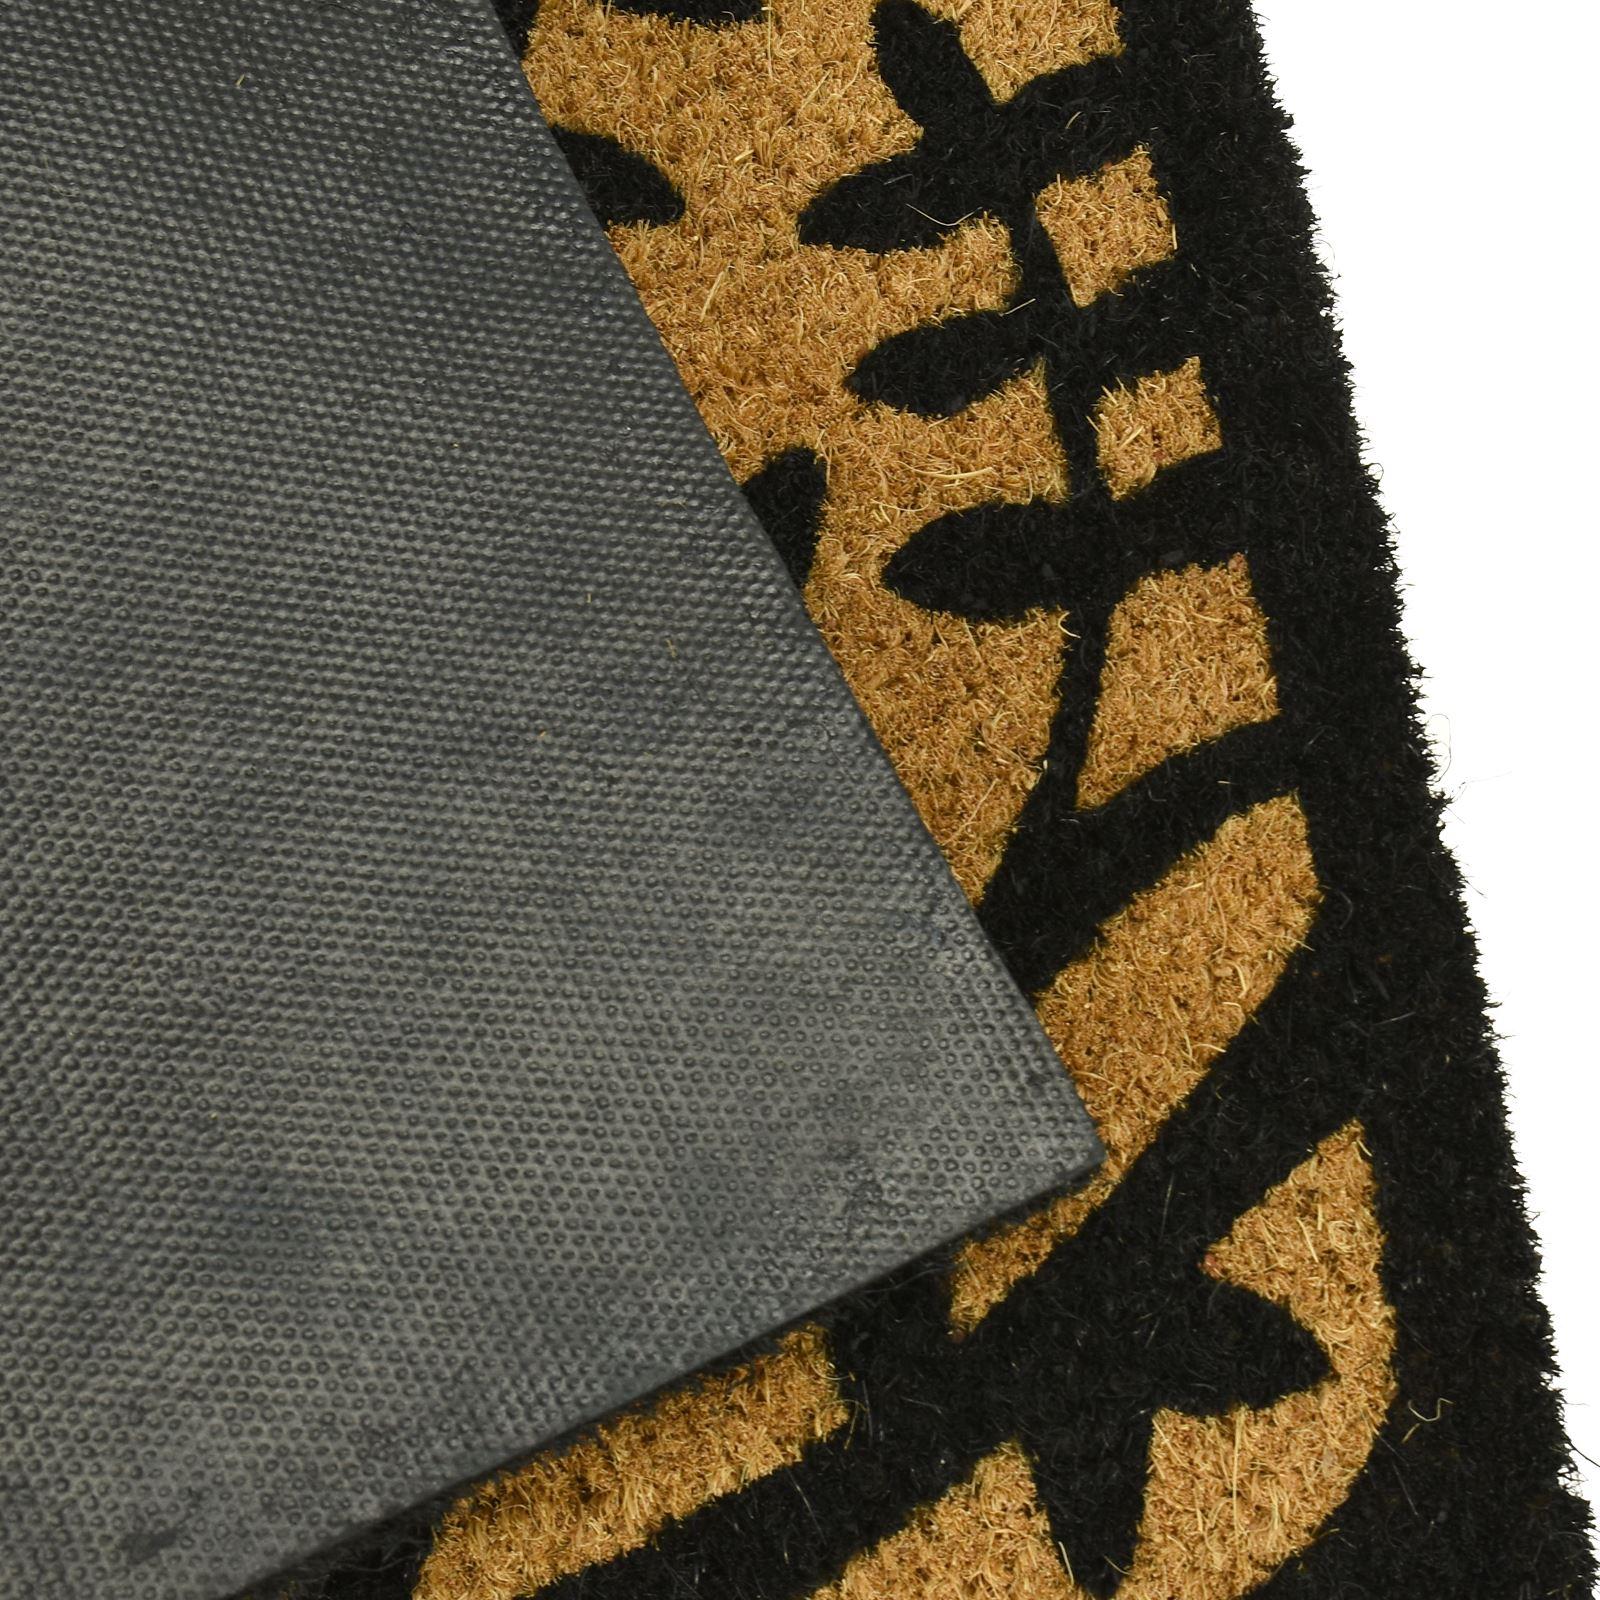 Plain-Non-Slip-Door-Mat-Tough-Natural-Coir-PVC-Back-Welcome-Doormat-40-x-60cm miniatura 91